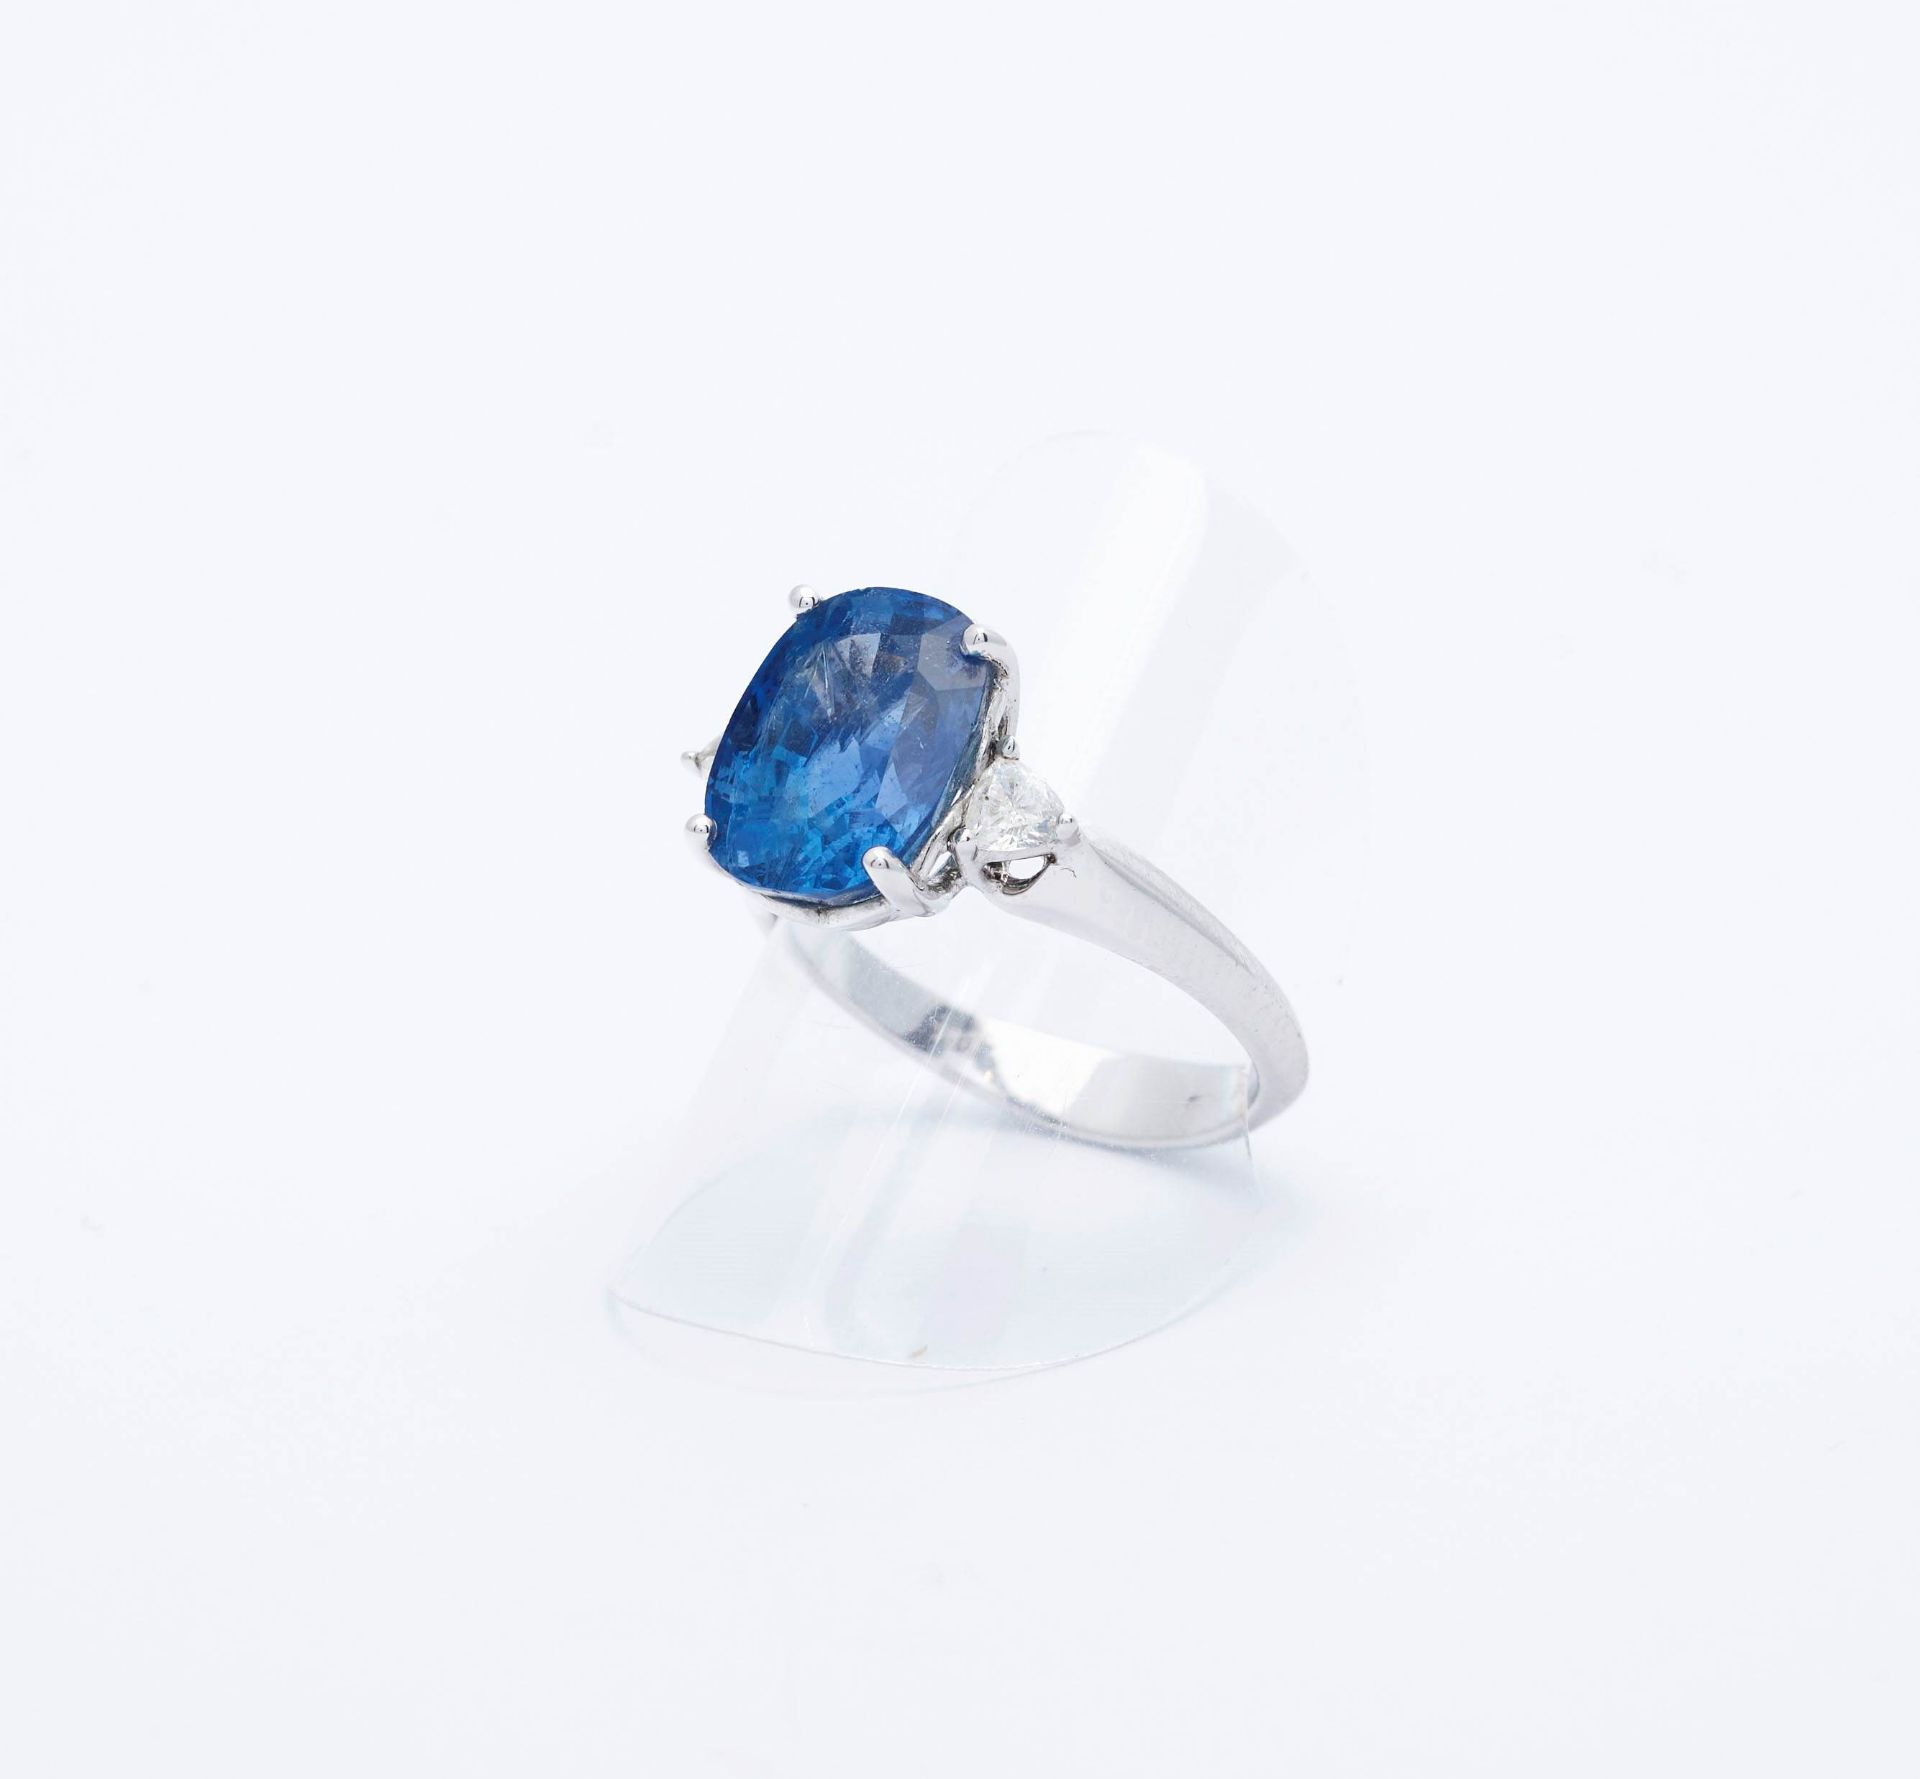 BURMA SAPPHIRE AND DIAMOND RING. - Image 5 of 5